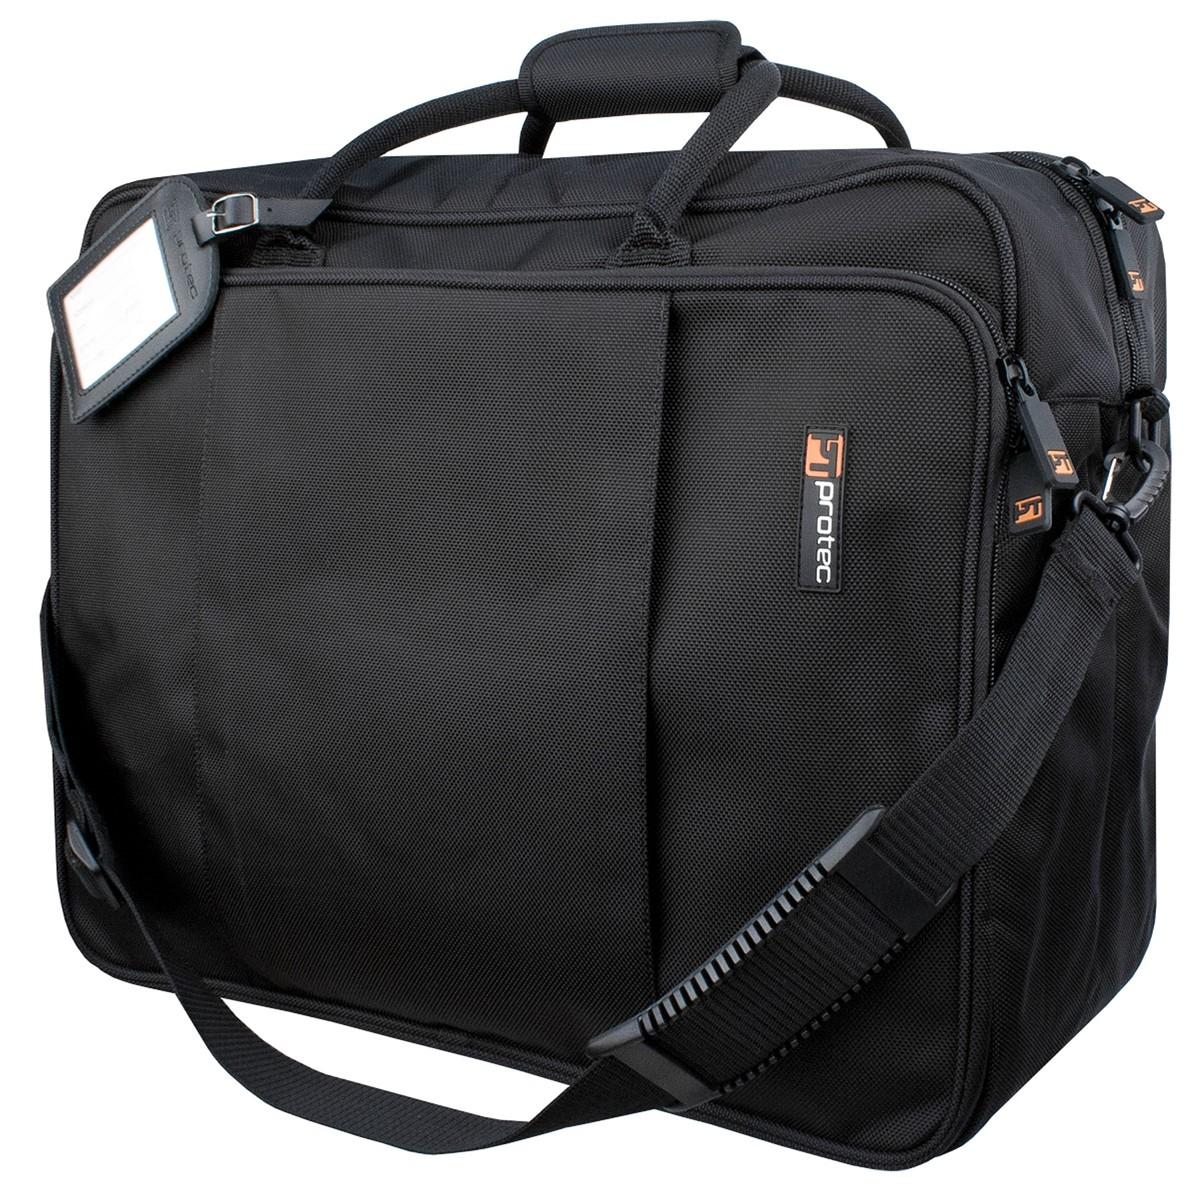 Protec Bass Trombone Mute Bag with Modular Divider (M402)